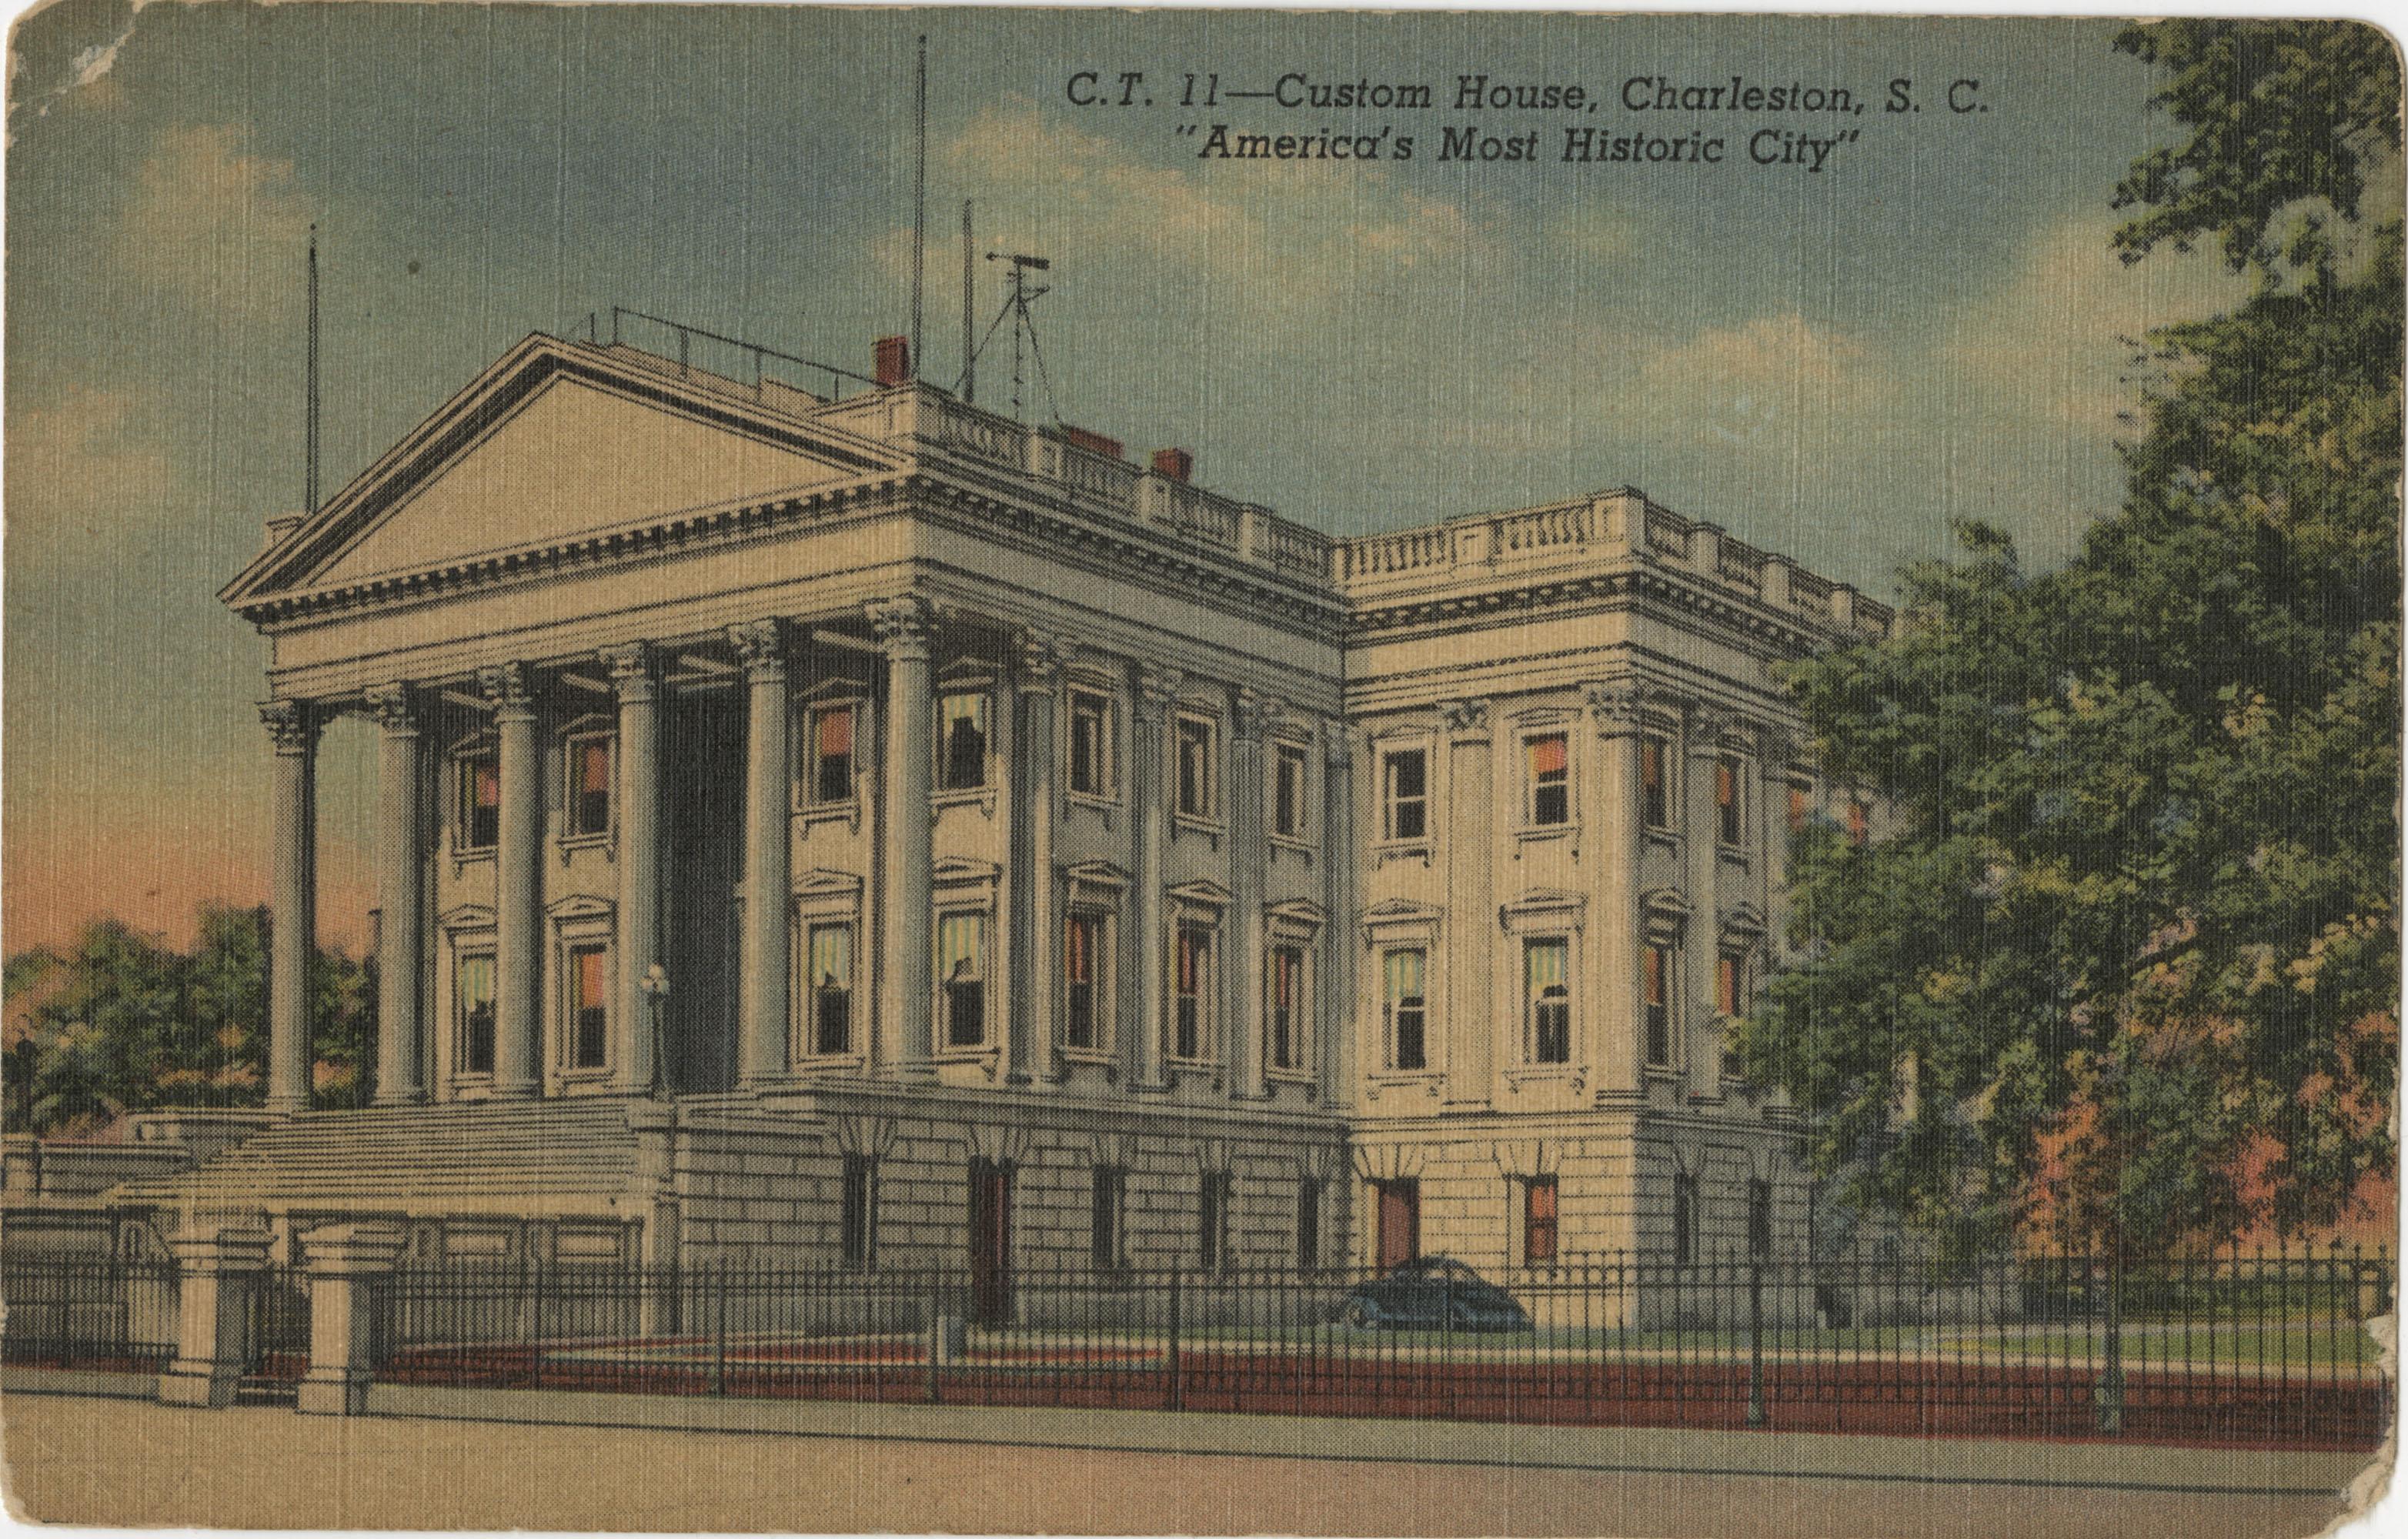 Custom House, Charleston, S.C.